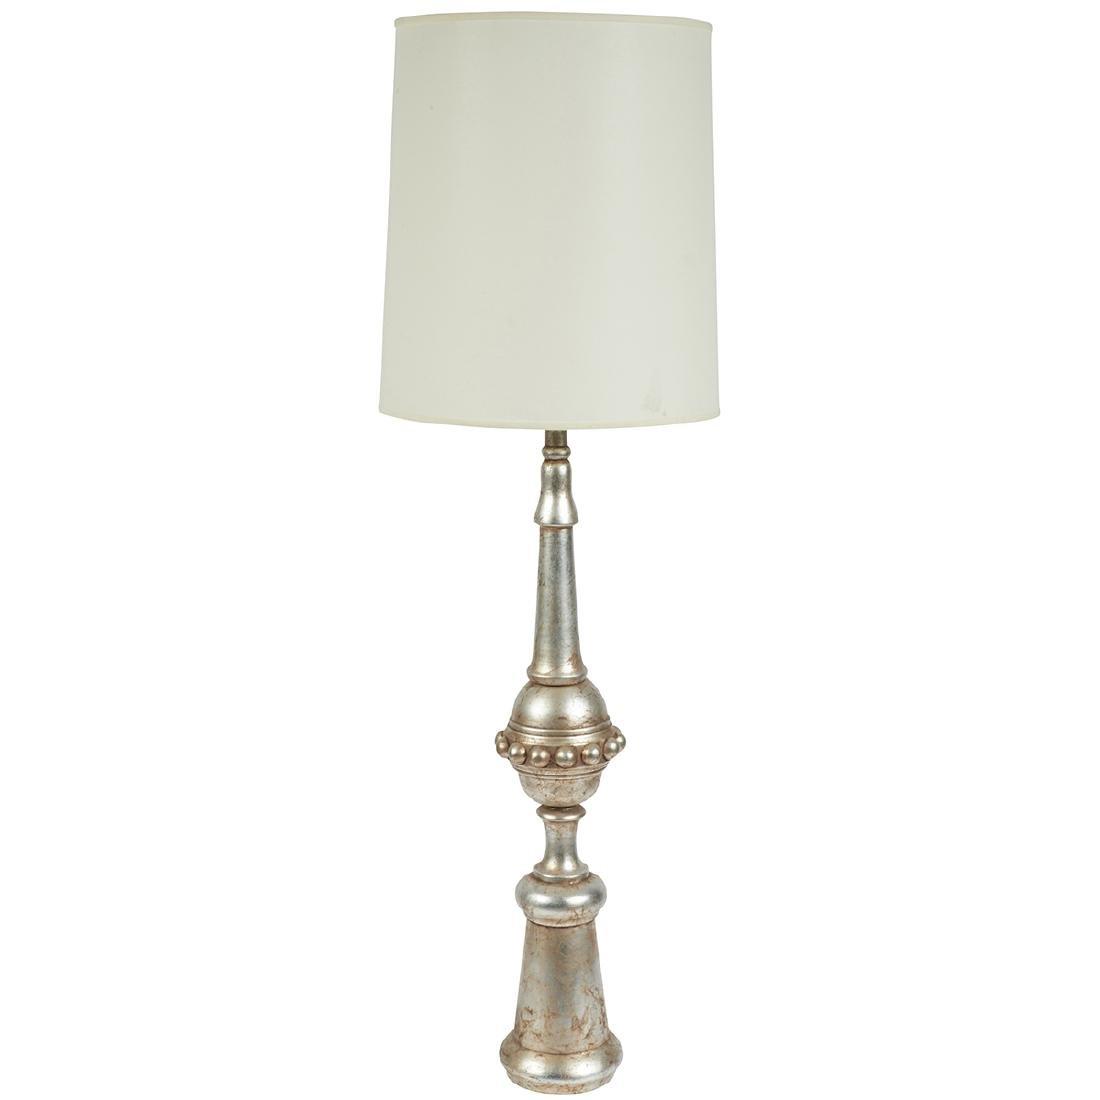 Mid-century Modern large table lamp